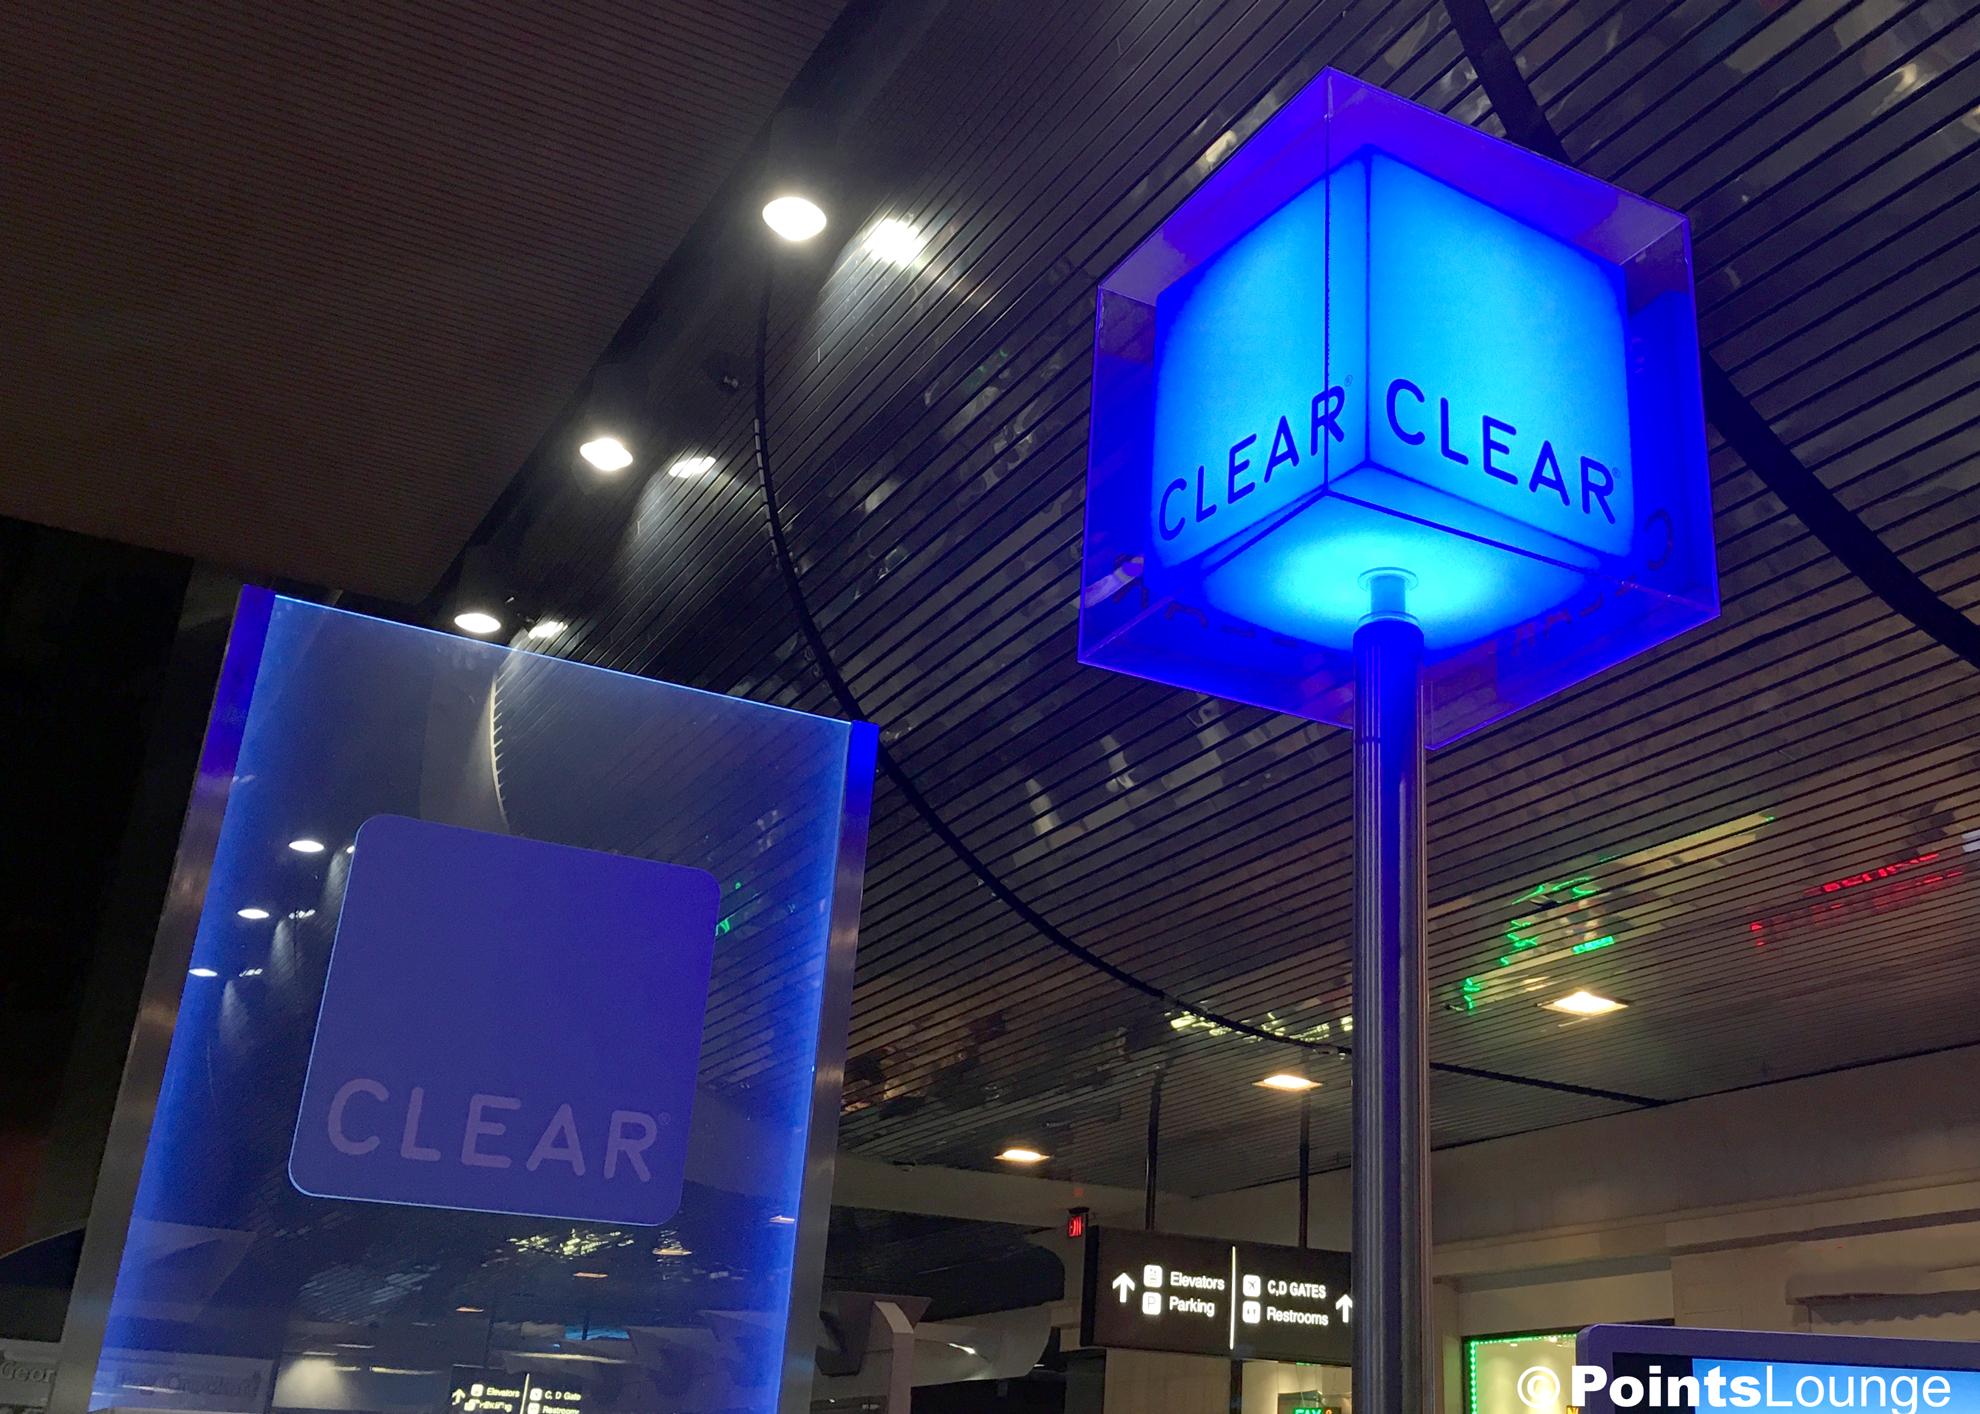 CLEAR registration/enrollment location at Las Vegas McCarran Airport.